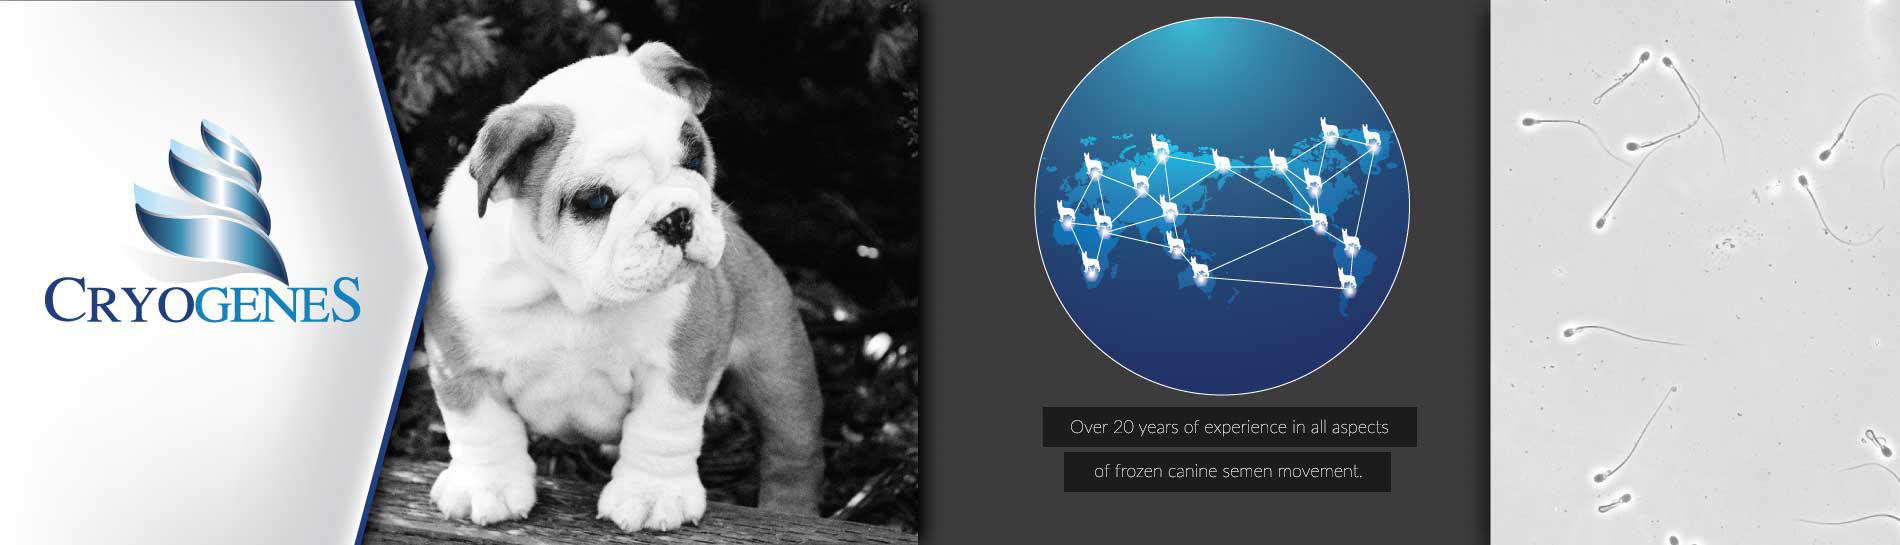 Services By Cryogenes - Canine Frozen Semen Transportation